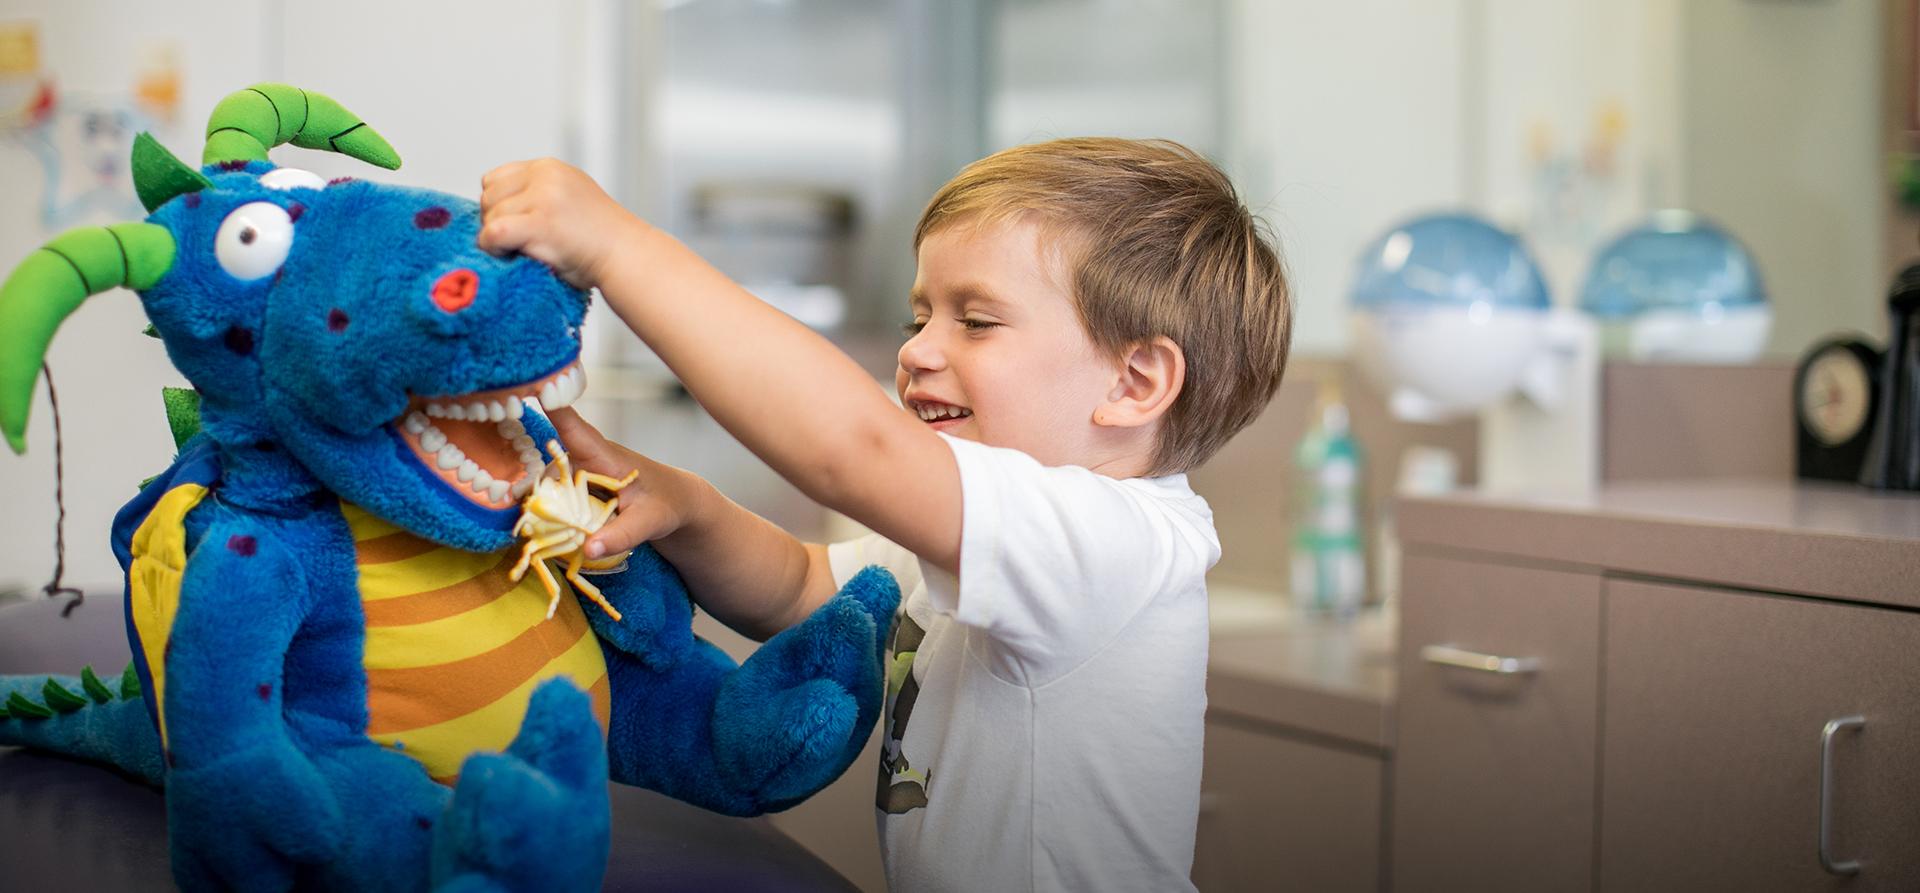 oxnard childrens dental group sugar bug